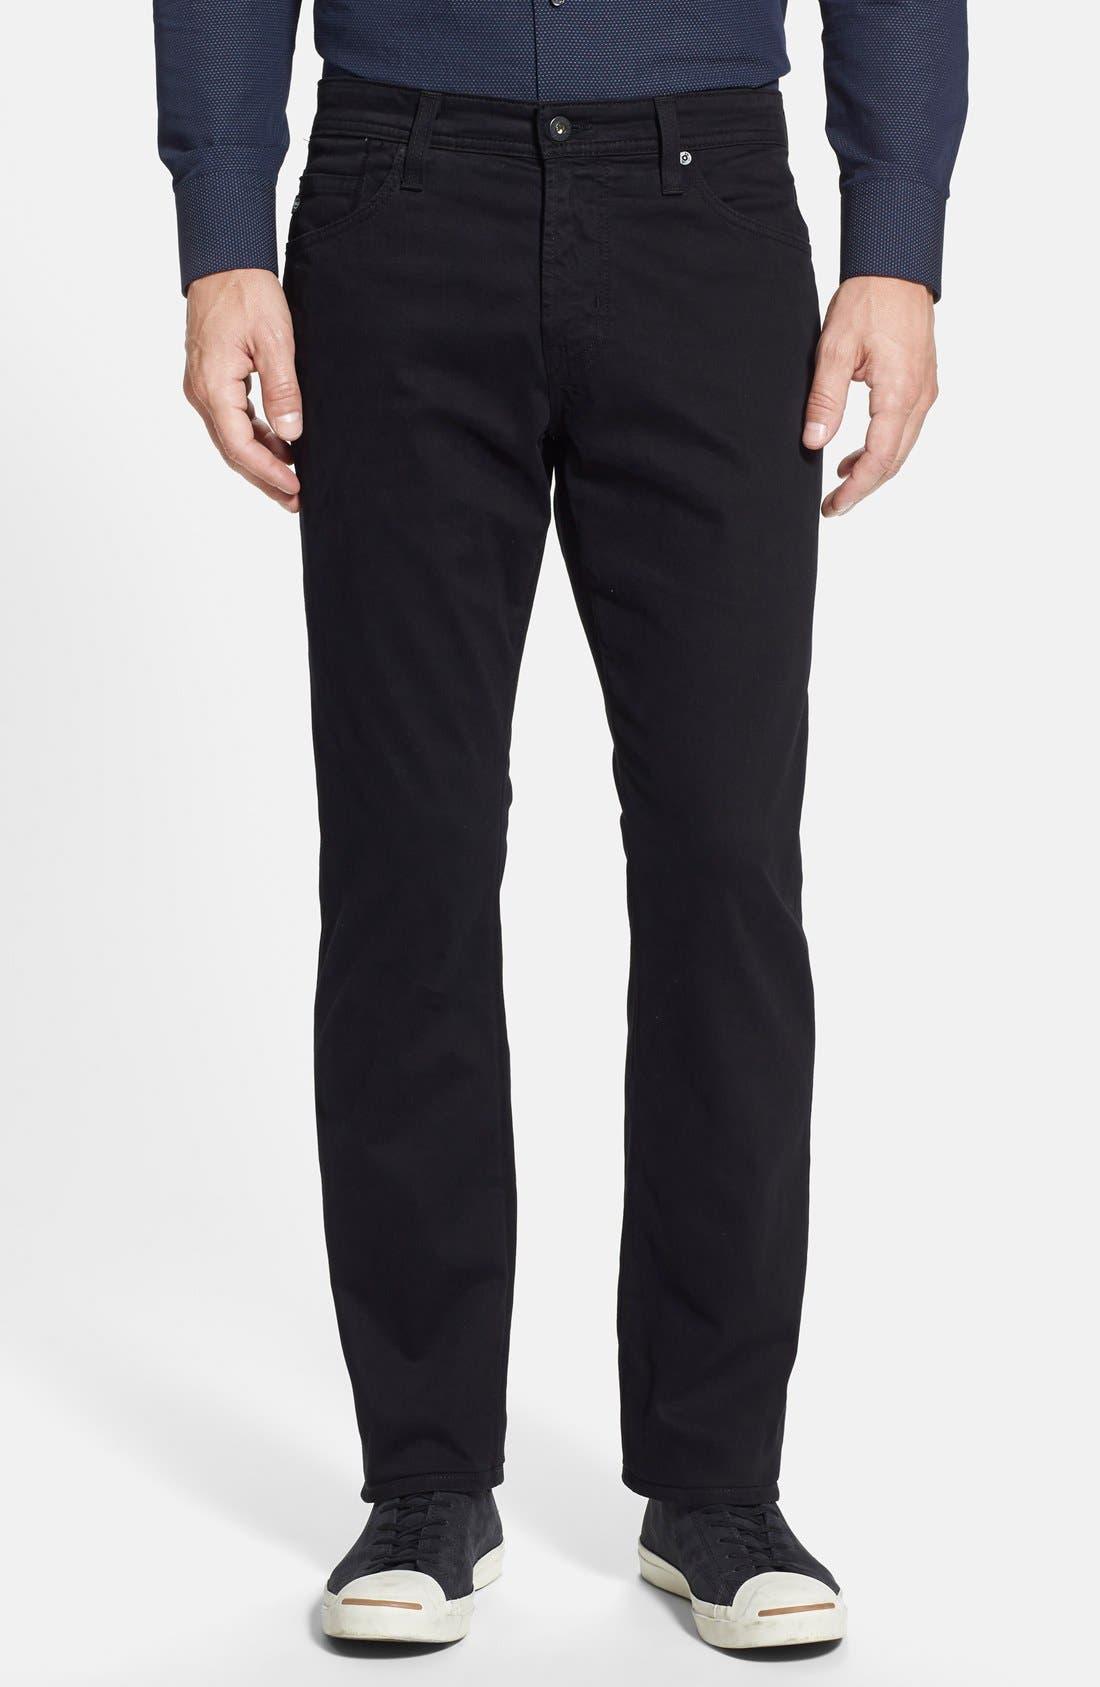 Graduate SUD Slim Straight Leg Pants,                             Main thumbnail 1, color,                             BLACK